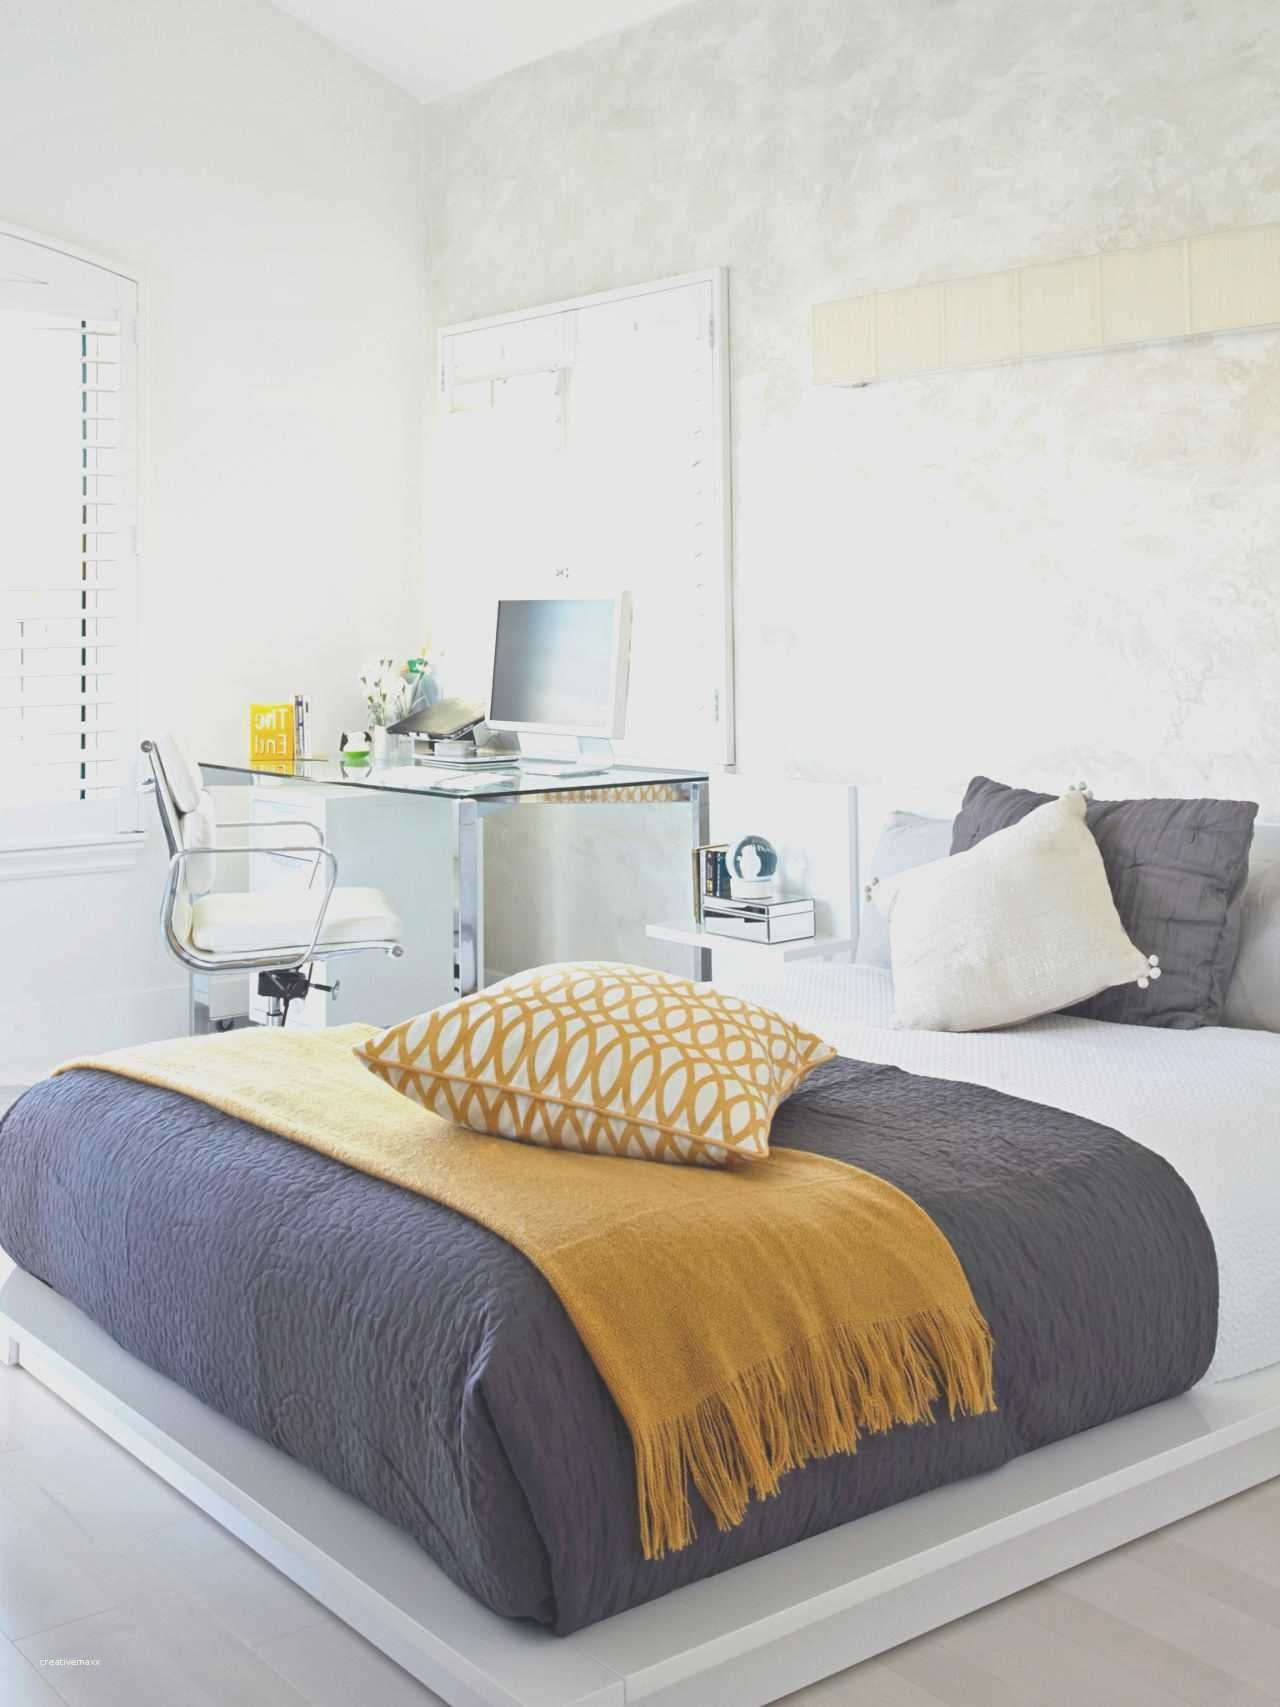 Grey yellow and blue bedroom inspiration luxury grey yellow and blue bedroom inspiration graceful small vintage boy nursery design ideas present